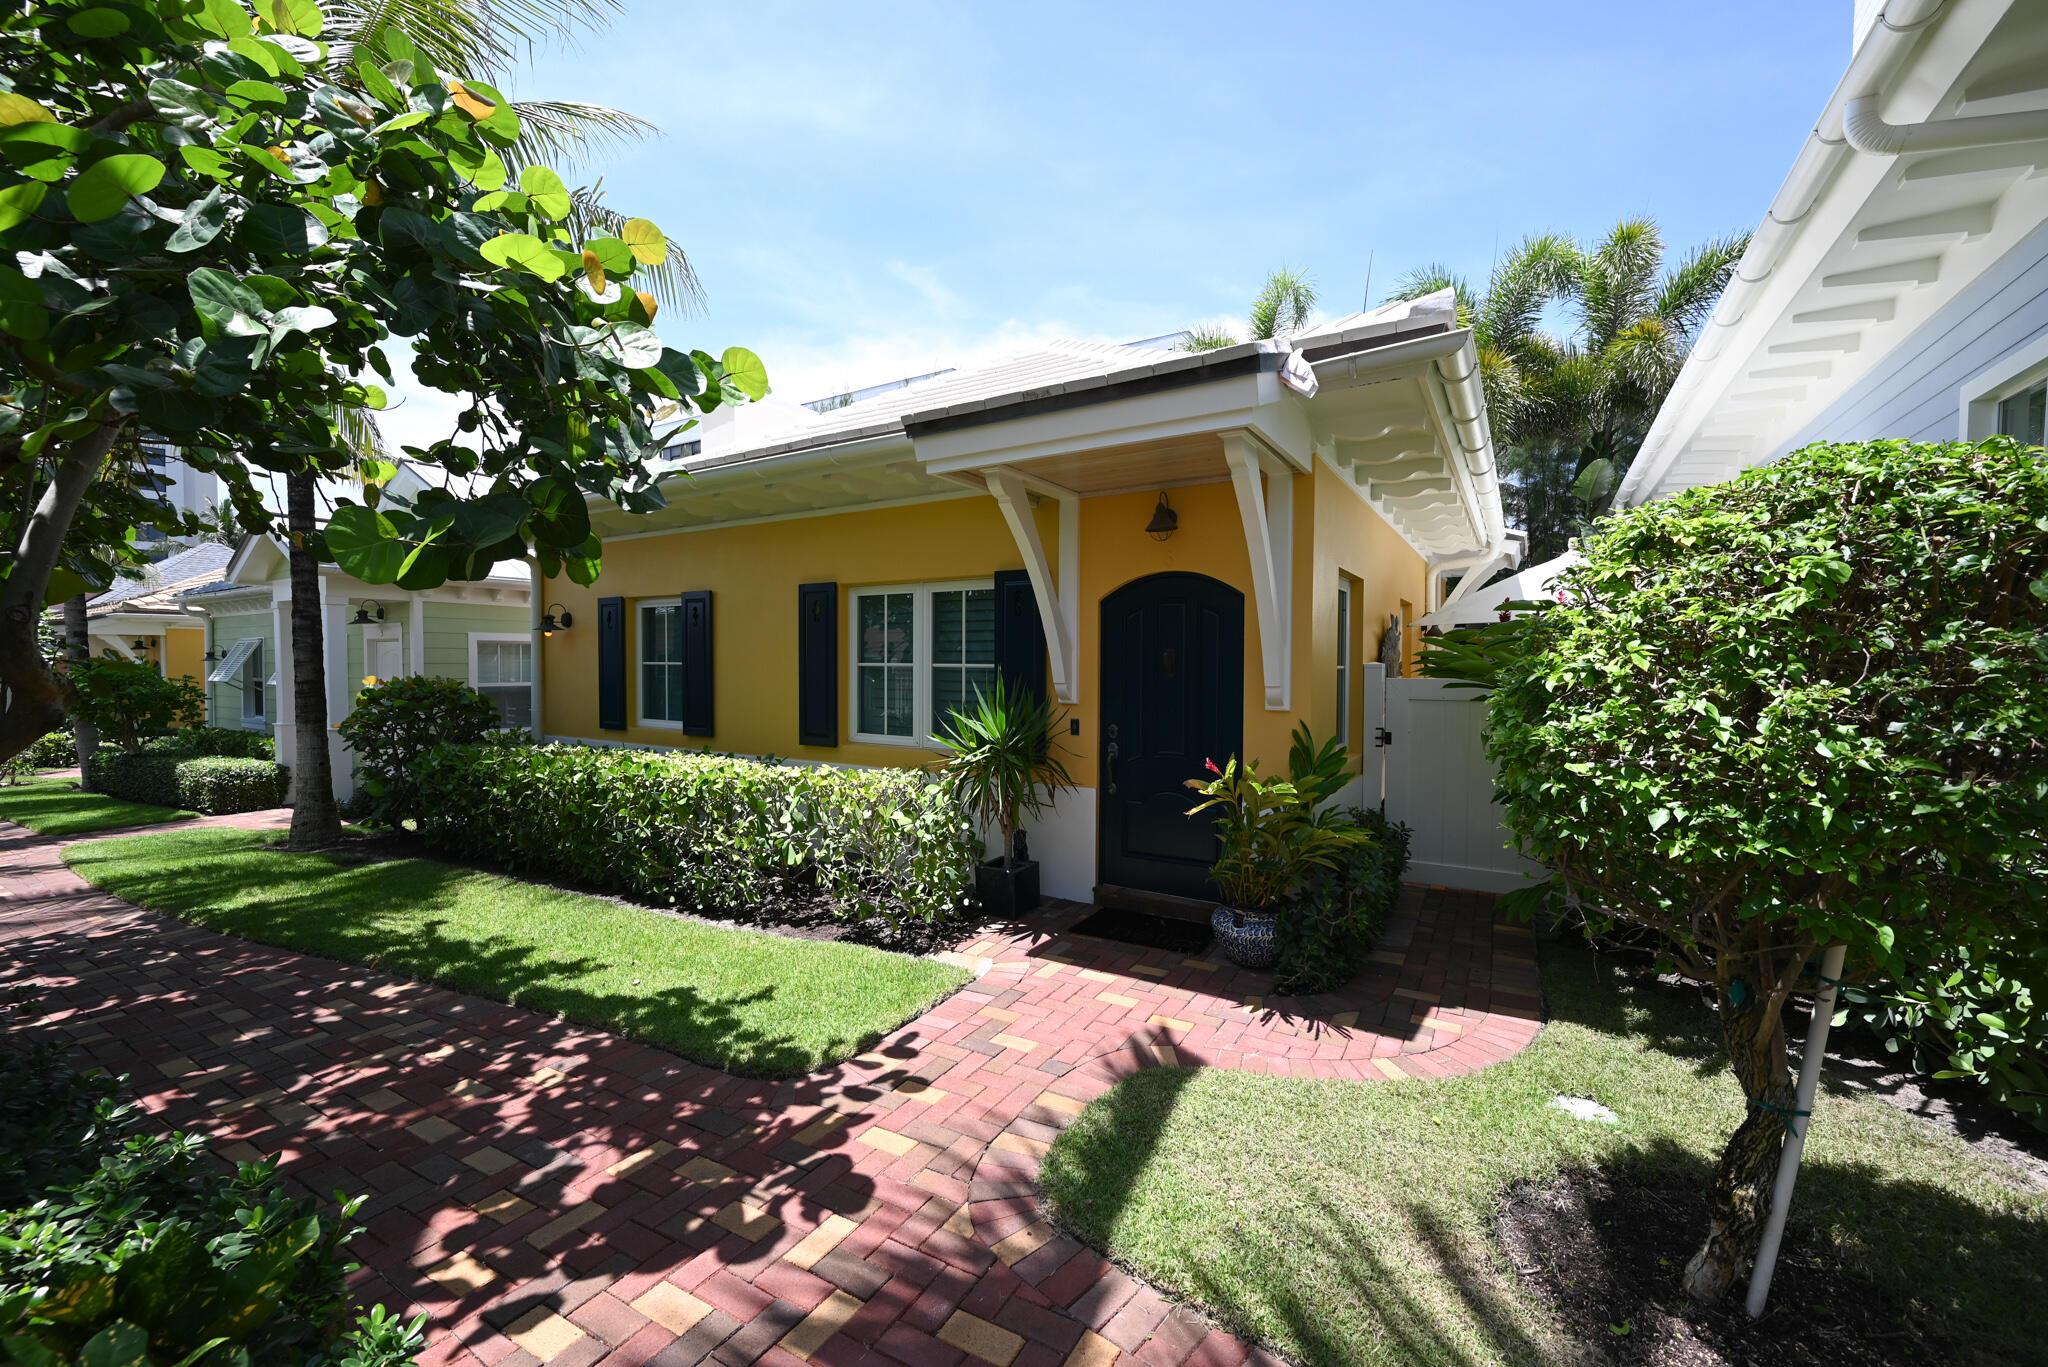 Home for sale in DELRAY VILLAGE BY THE SEA CONDO Delray Beach Florida